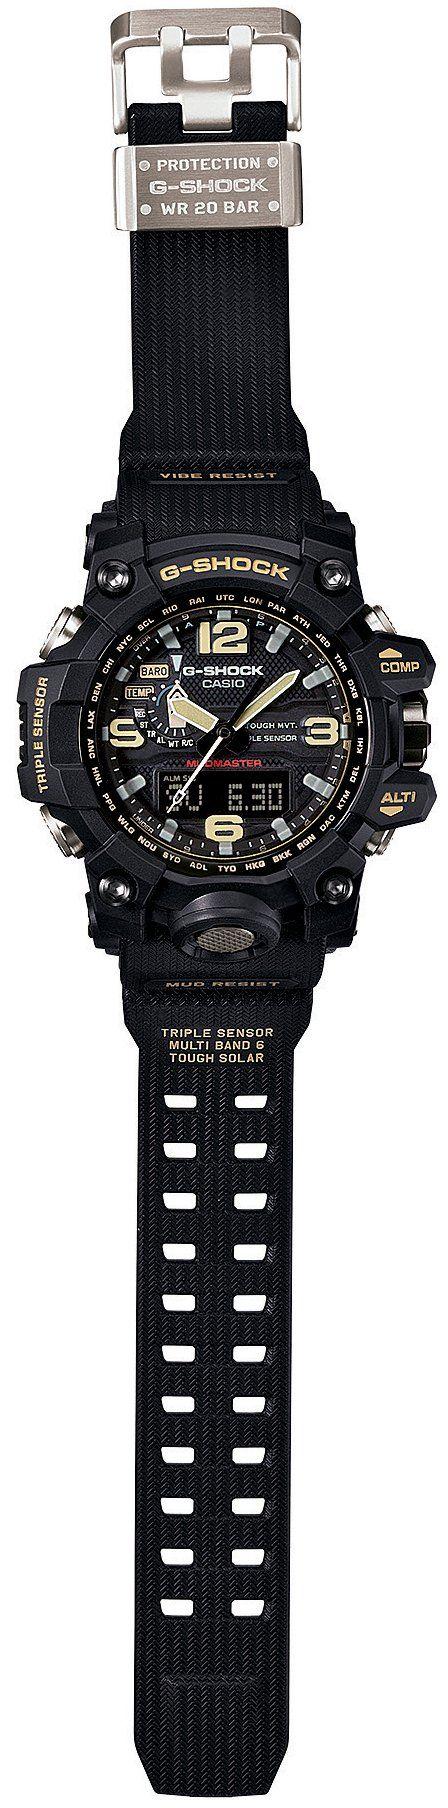 Amazon.co.jp: [カシオ]CASIO 腕時計 G-SHOCK MUDMASTER 世界6局対応電波ソーラー GWG-1000-1AJF メンズ: 腕時計通販